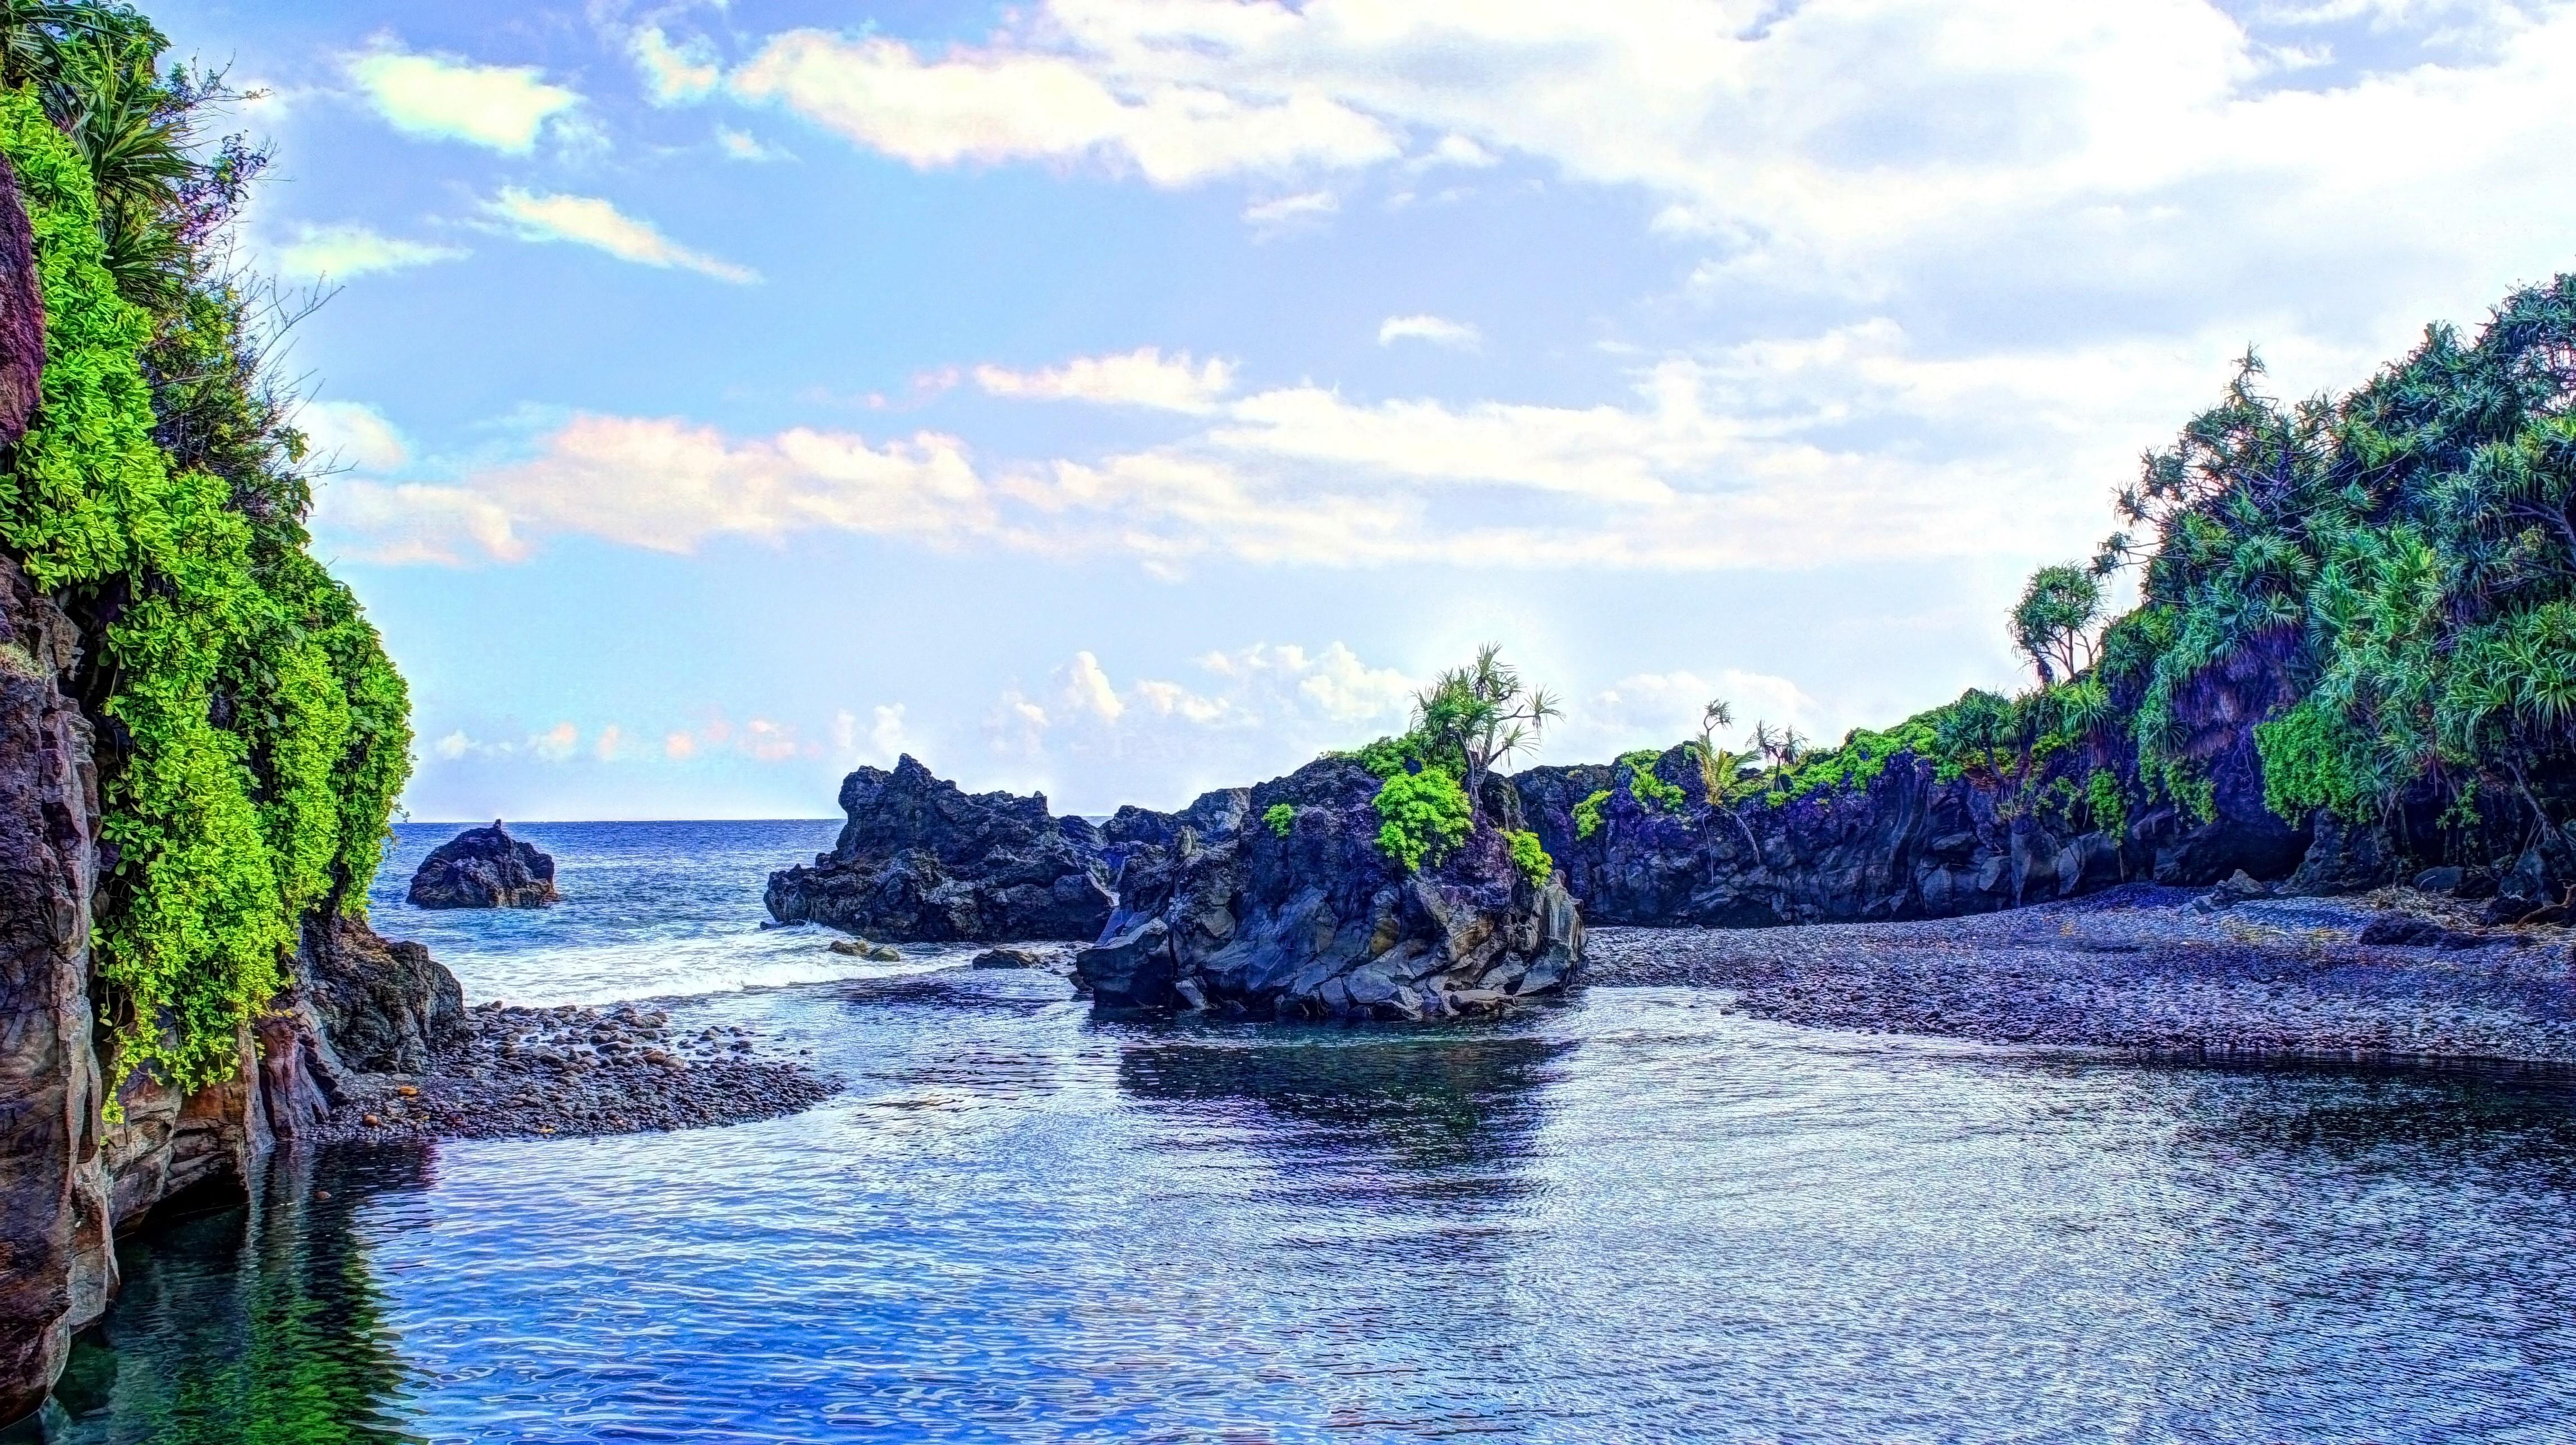 General 4591x2575 tropical water tropical forest Hawaii isle of Maui Maui palm trees beach waterfall